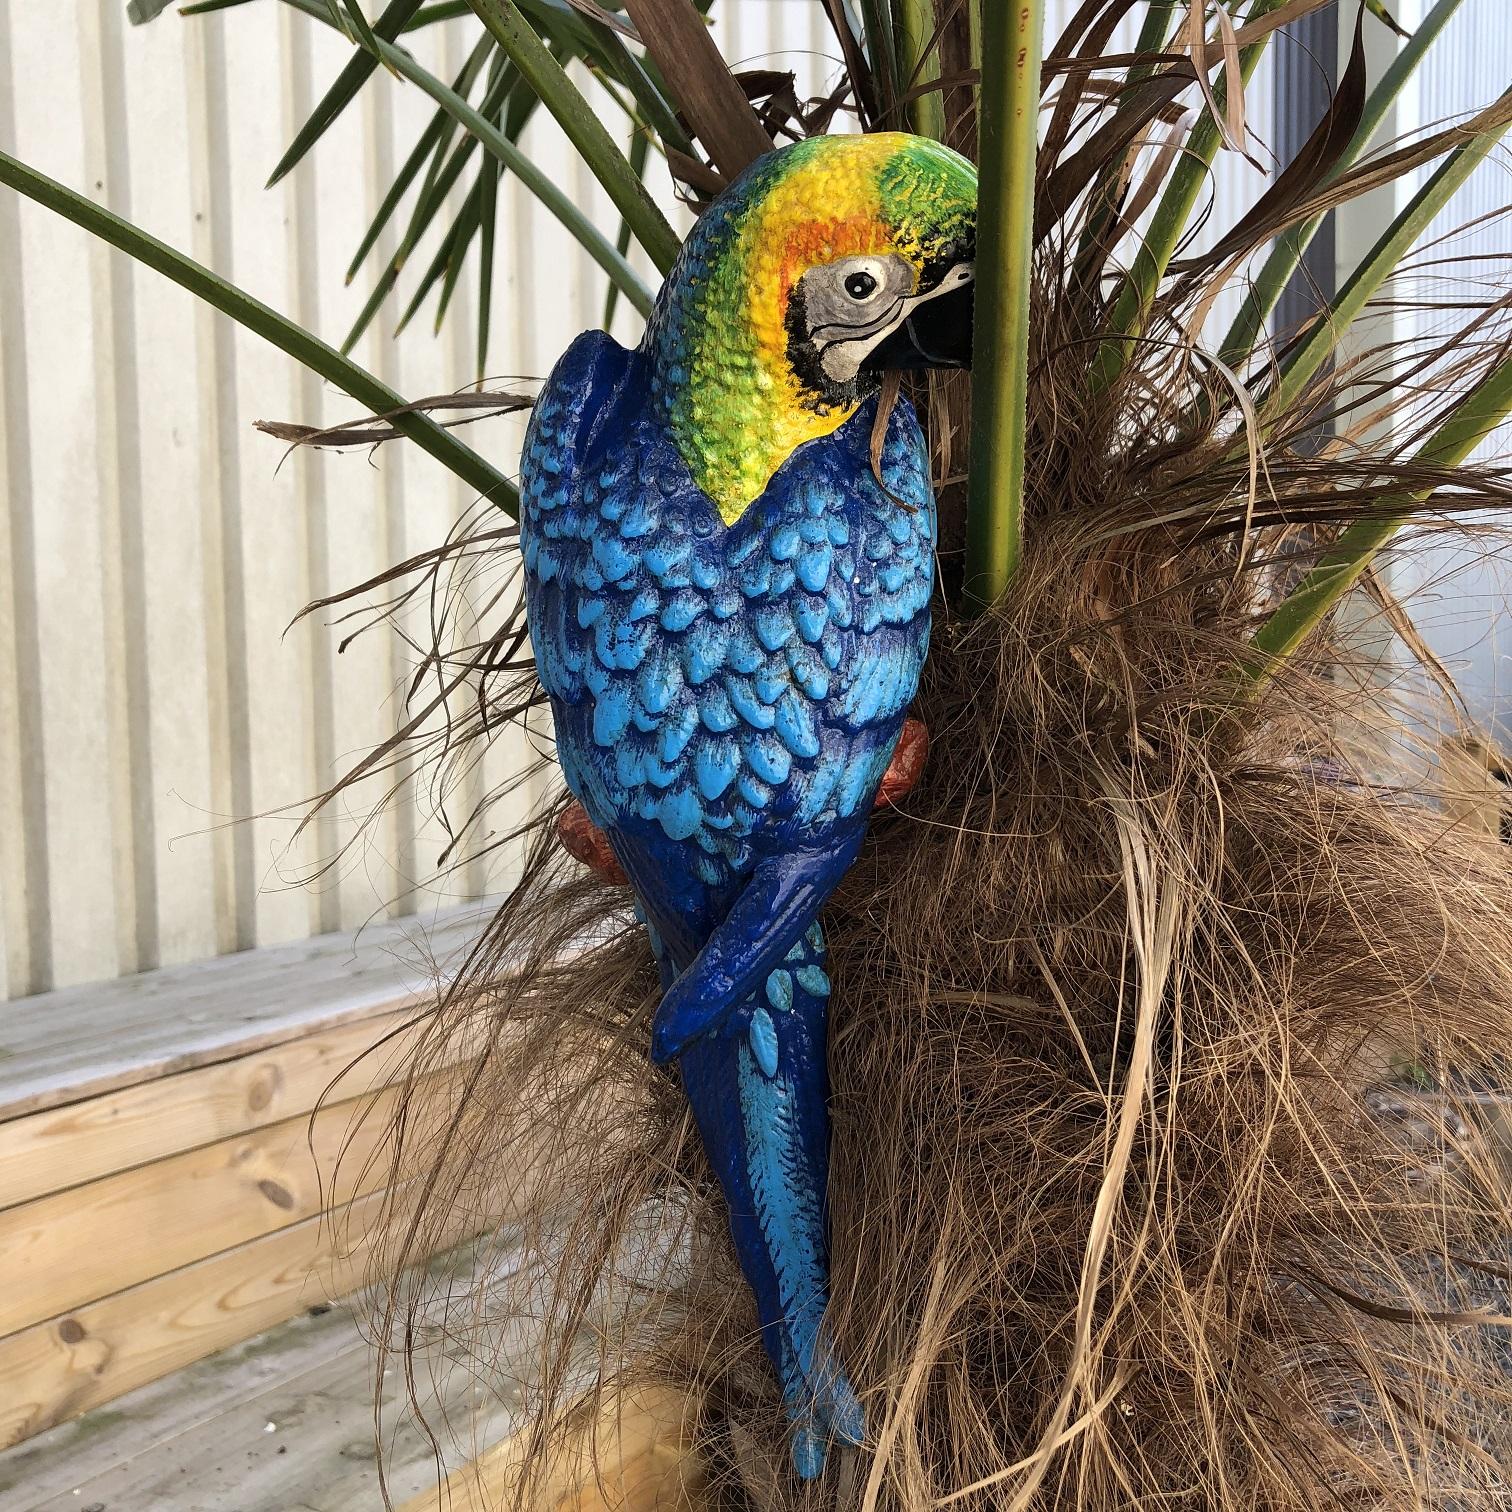 Spiksplinternieuw tags: wintertuin, papegaai, ara, blauwe papegaai, tuin, decoratie YV-52